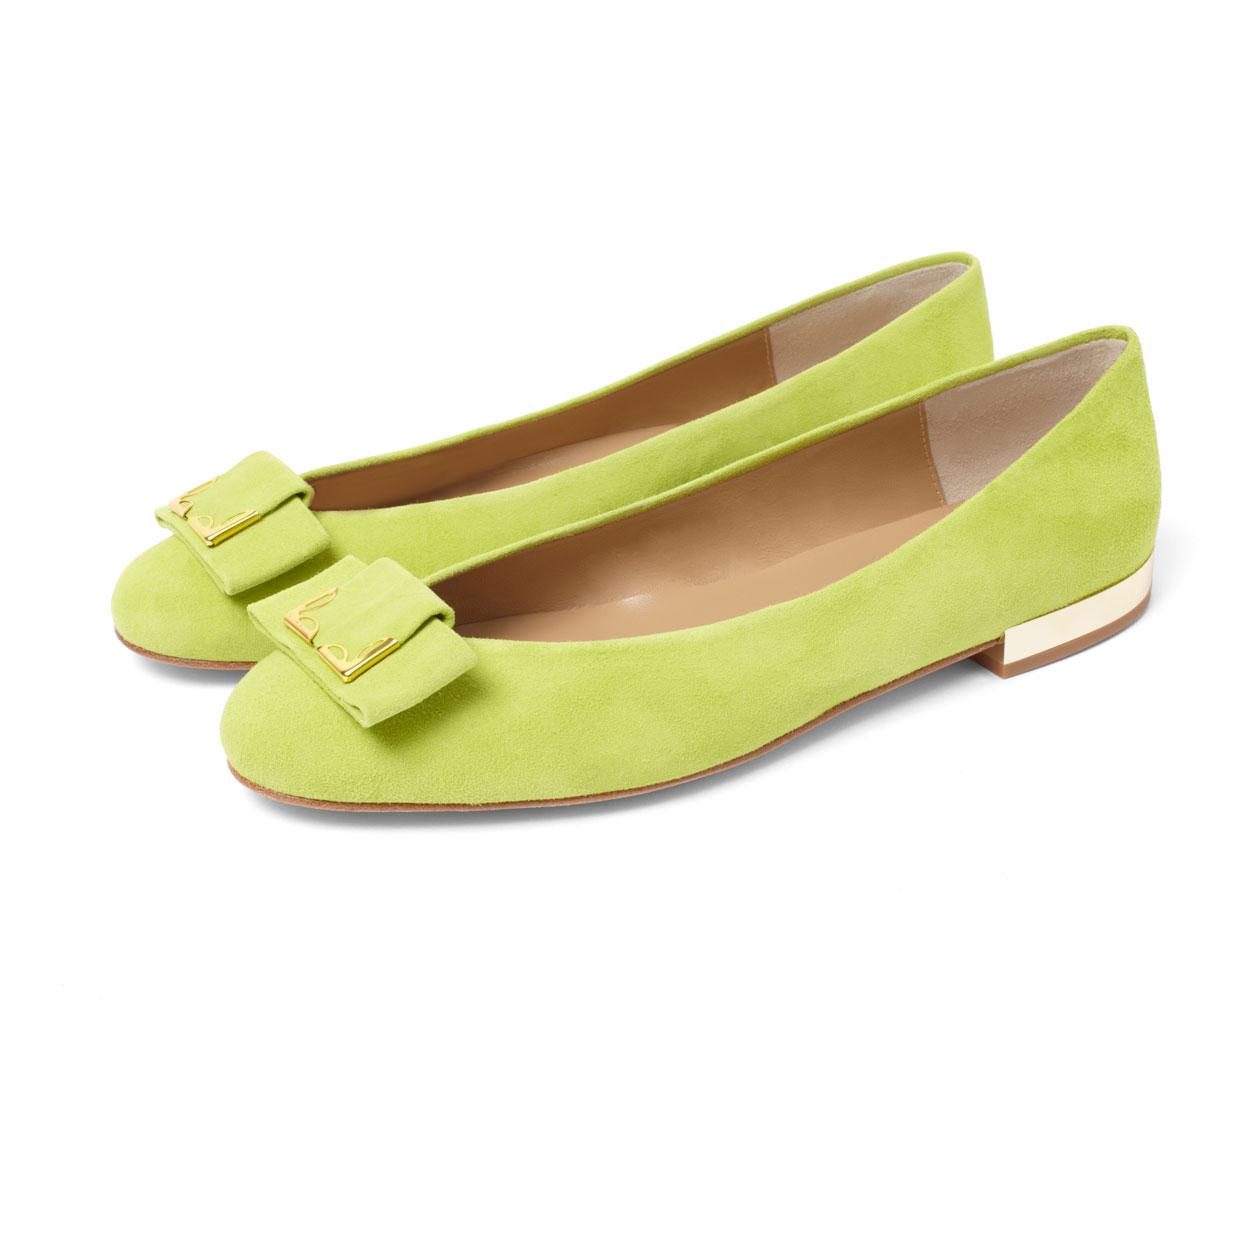 rainbow-clips-pistachio-onshoes-fashion-cleob-design-london-luxury-designer-shopping.jpg